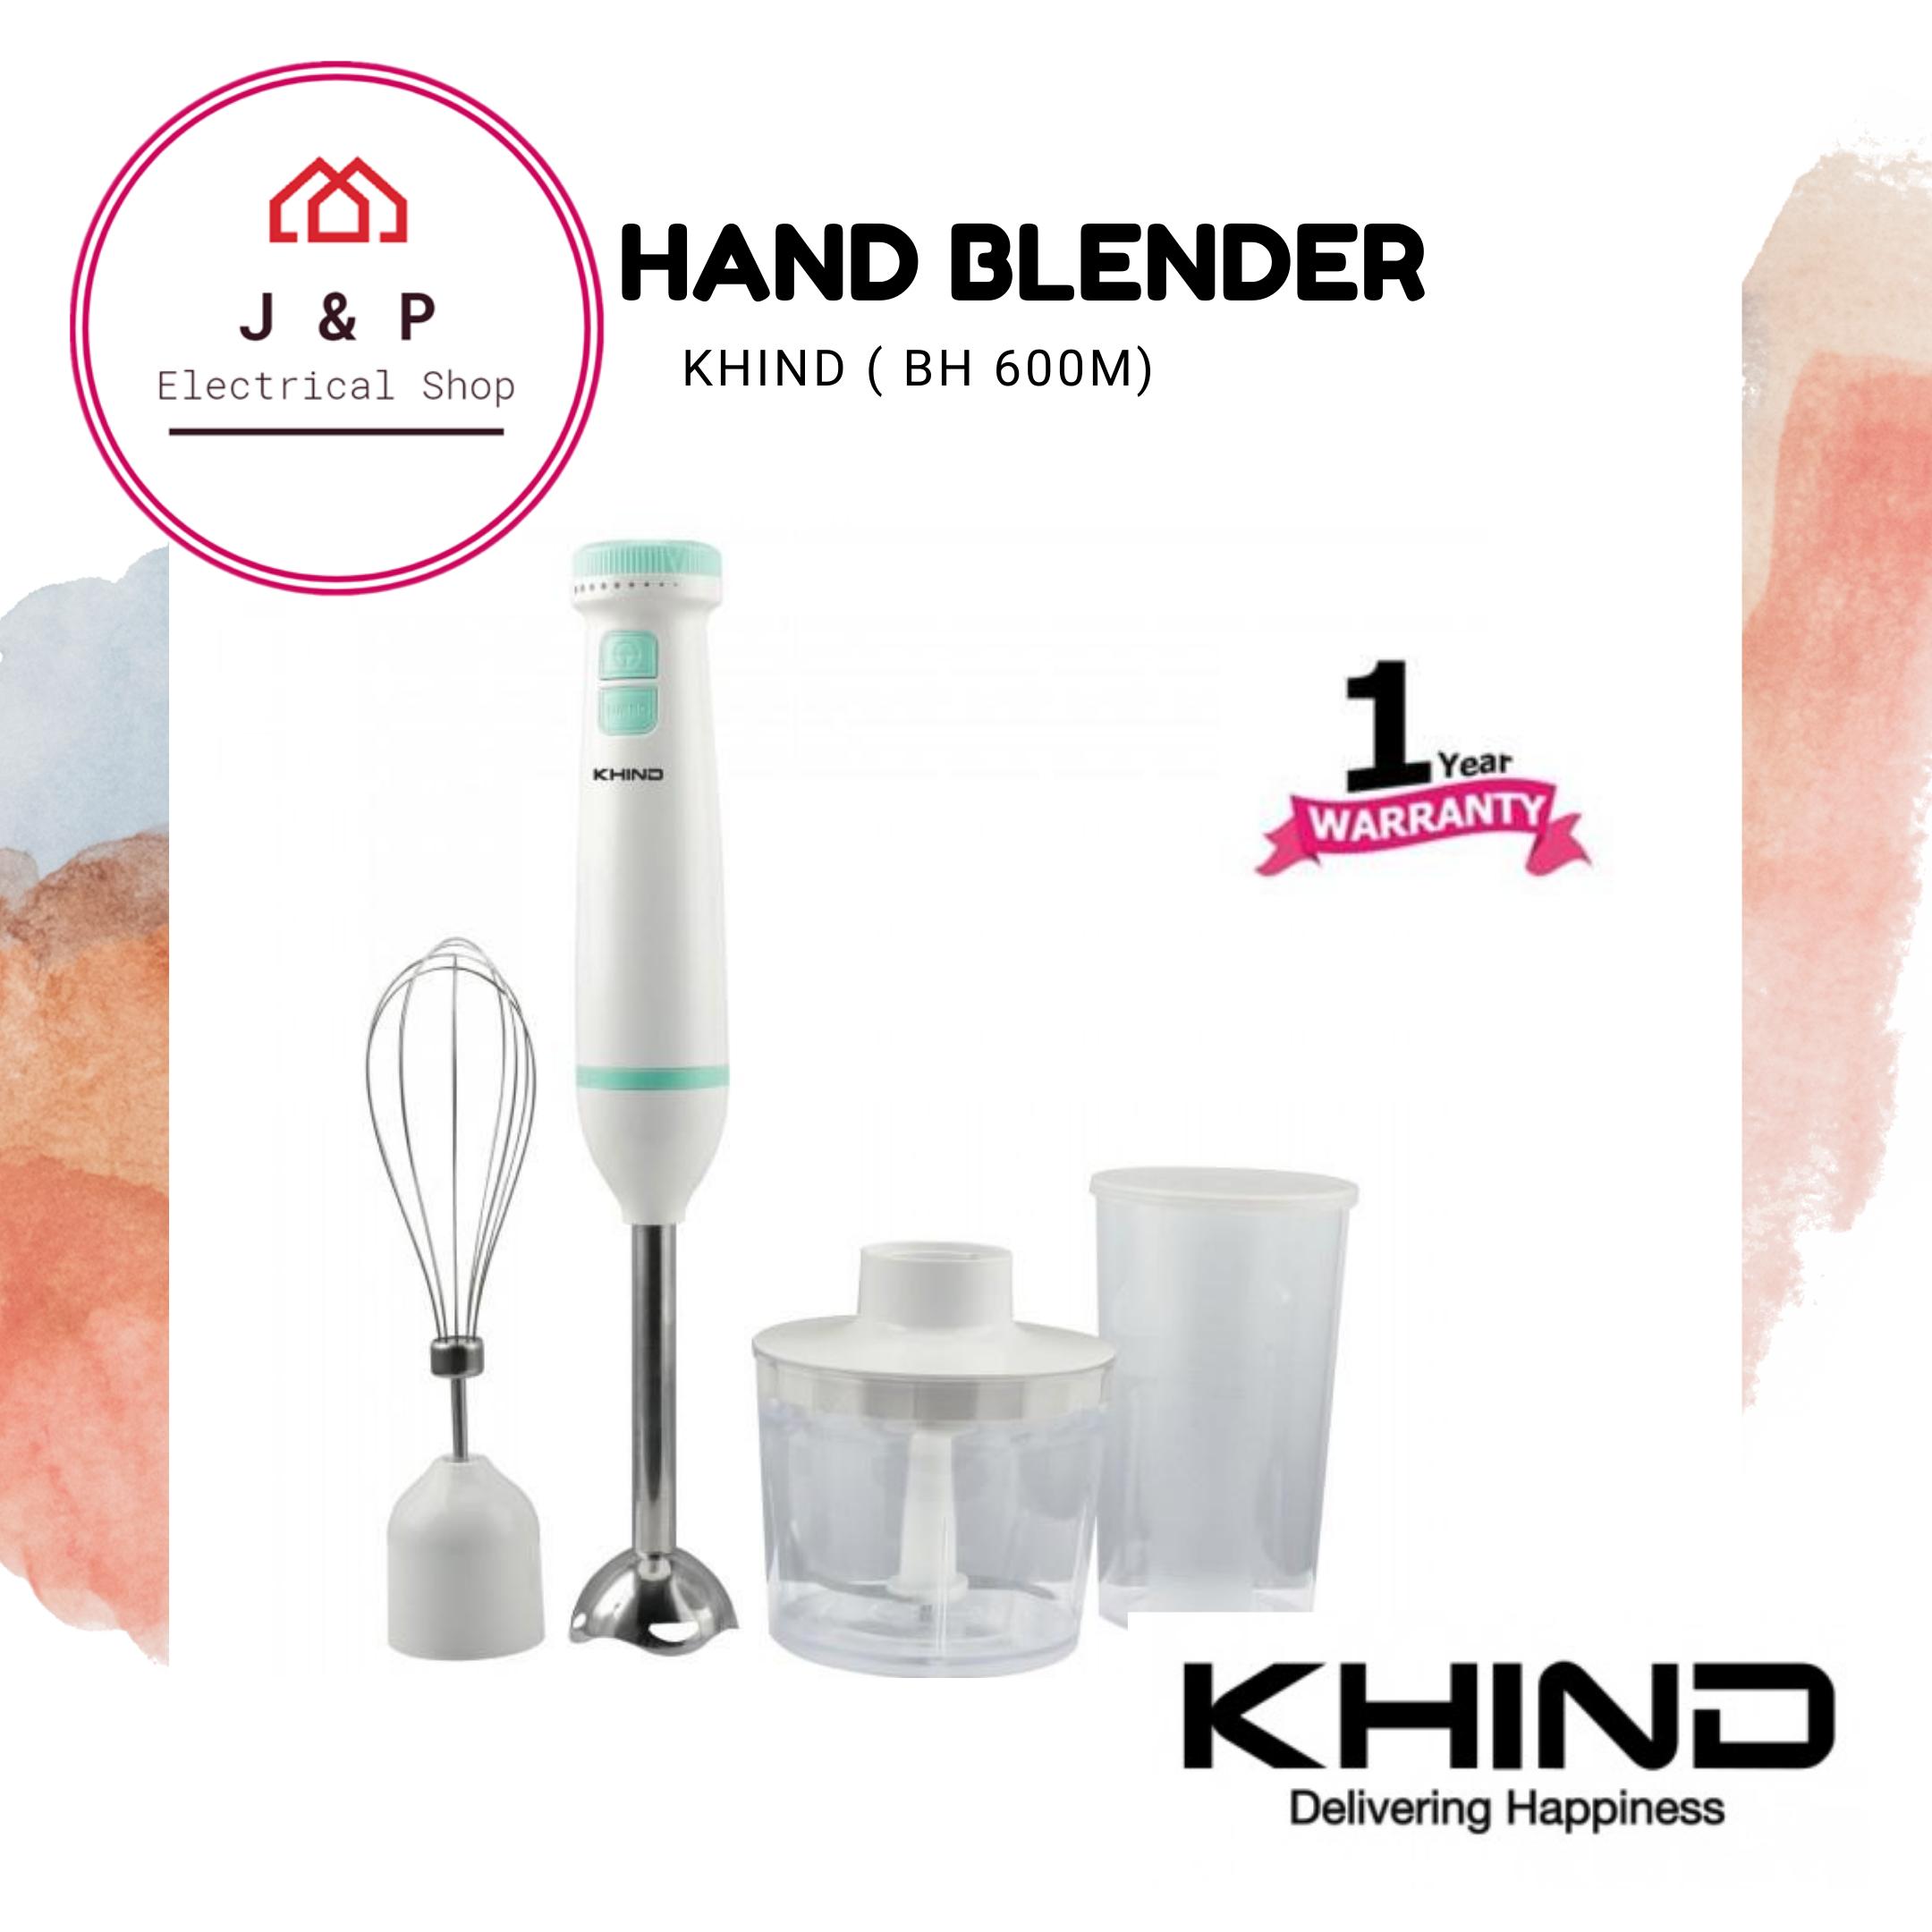 KHIND Hand Blender 手持式搅拌机 (BH600M)  [ READY STOCK 现货]1355330610-1597853838988-0